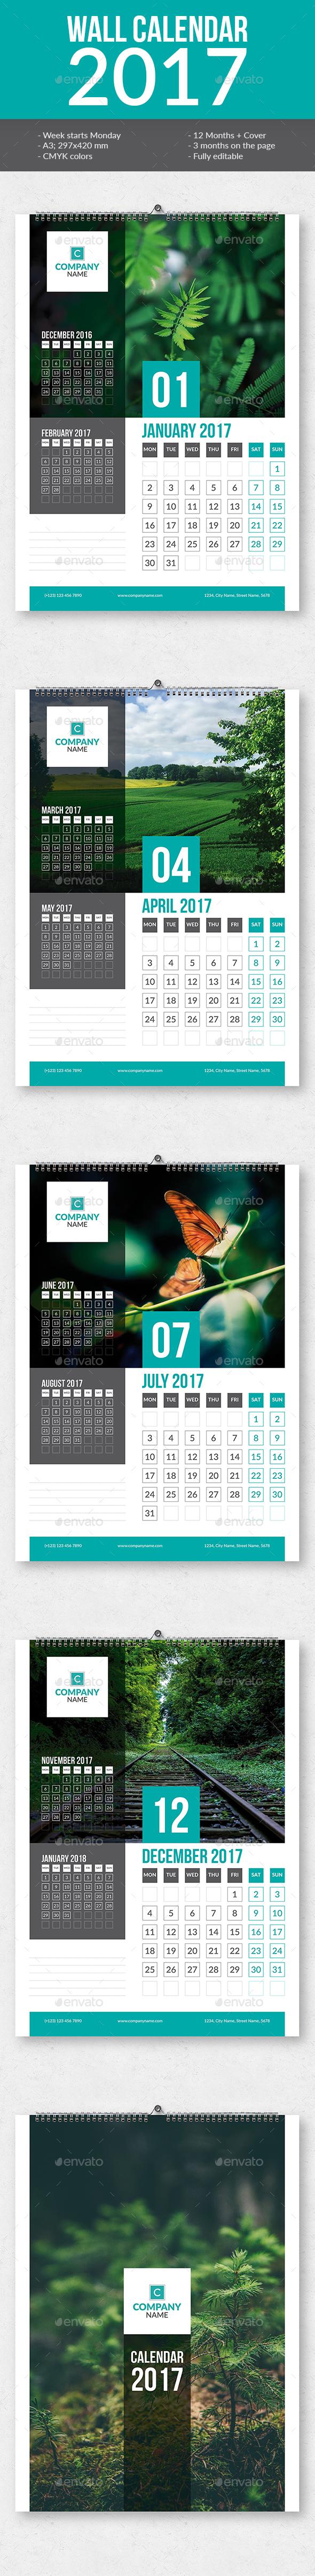 Wall Calendar 2017 - Calendars Stationery